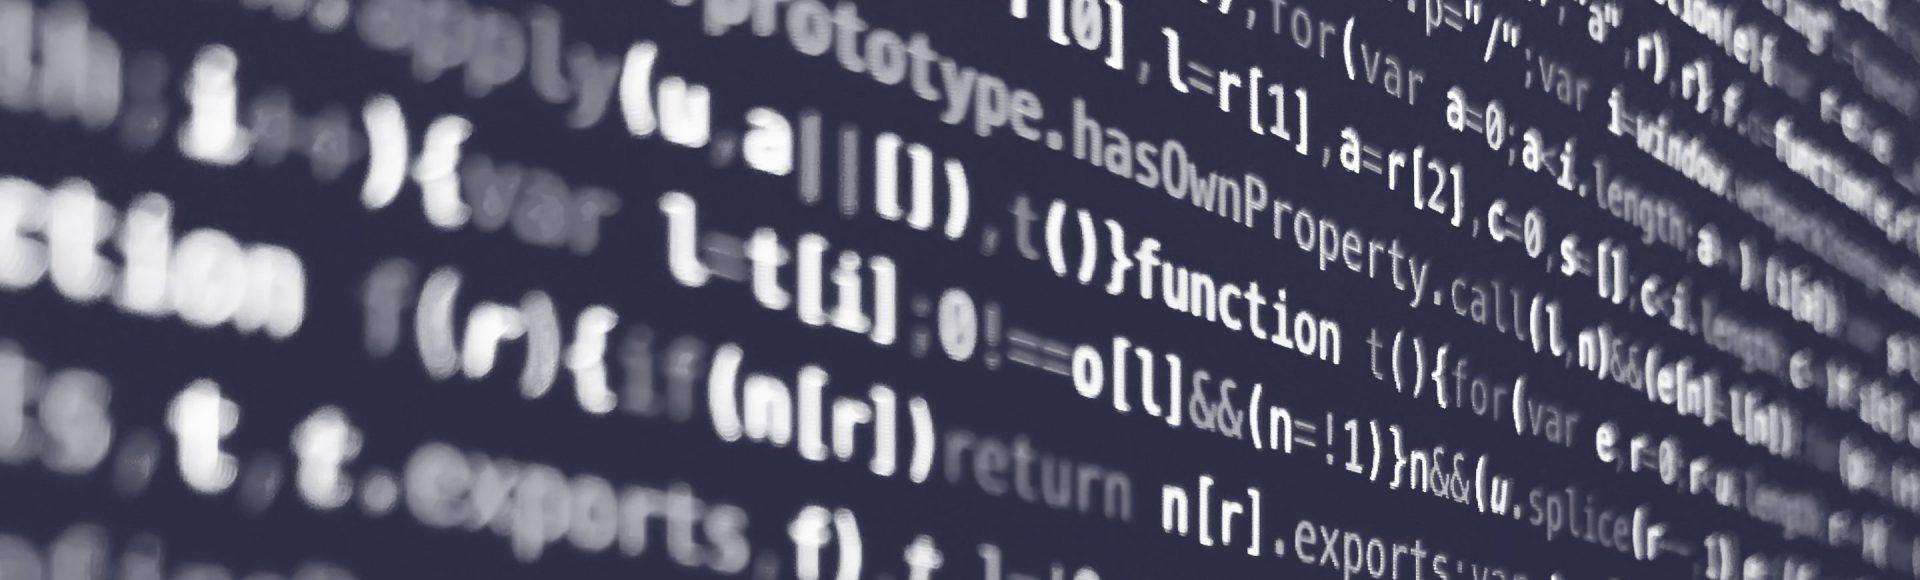 ARK-Invest_Blog-Banner_2016_05_03---Machine-Learning